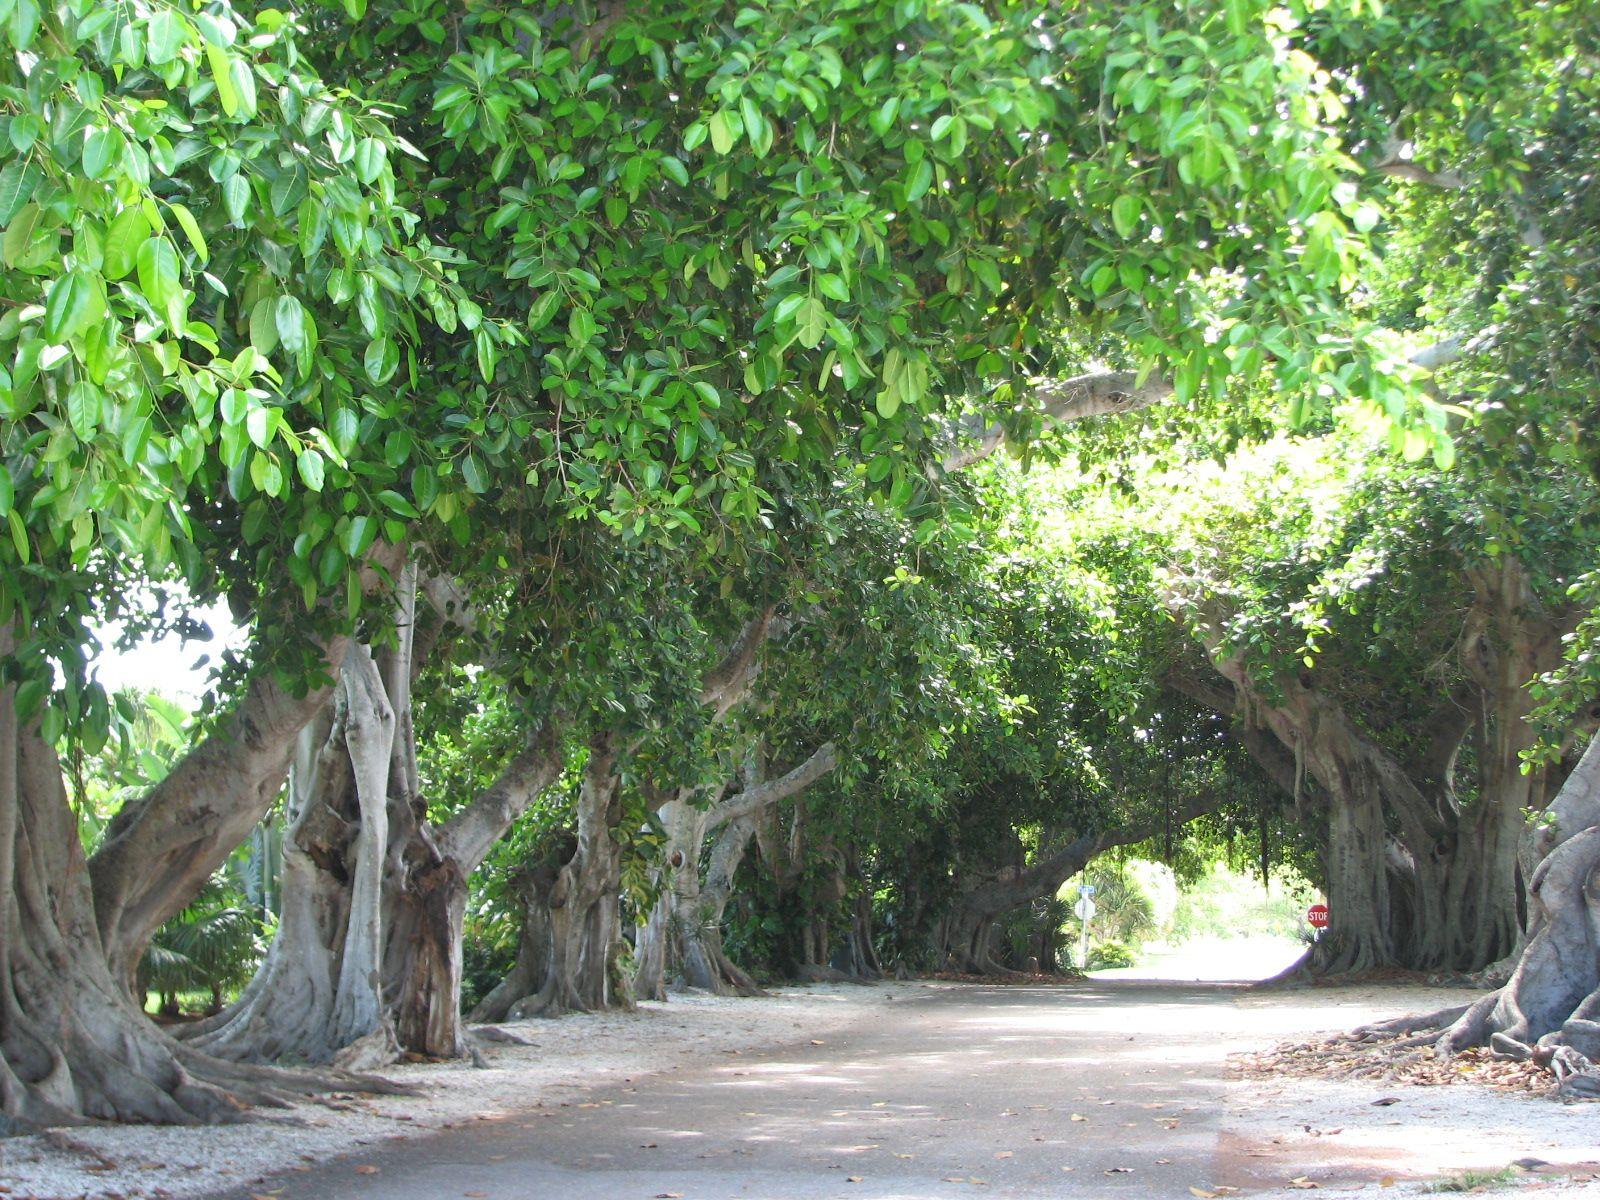 Banyan trees boca grande florida driving down the street